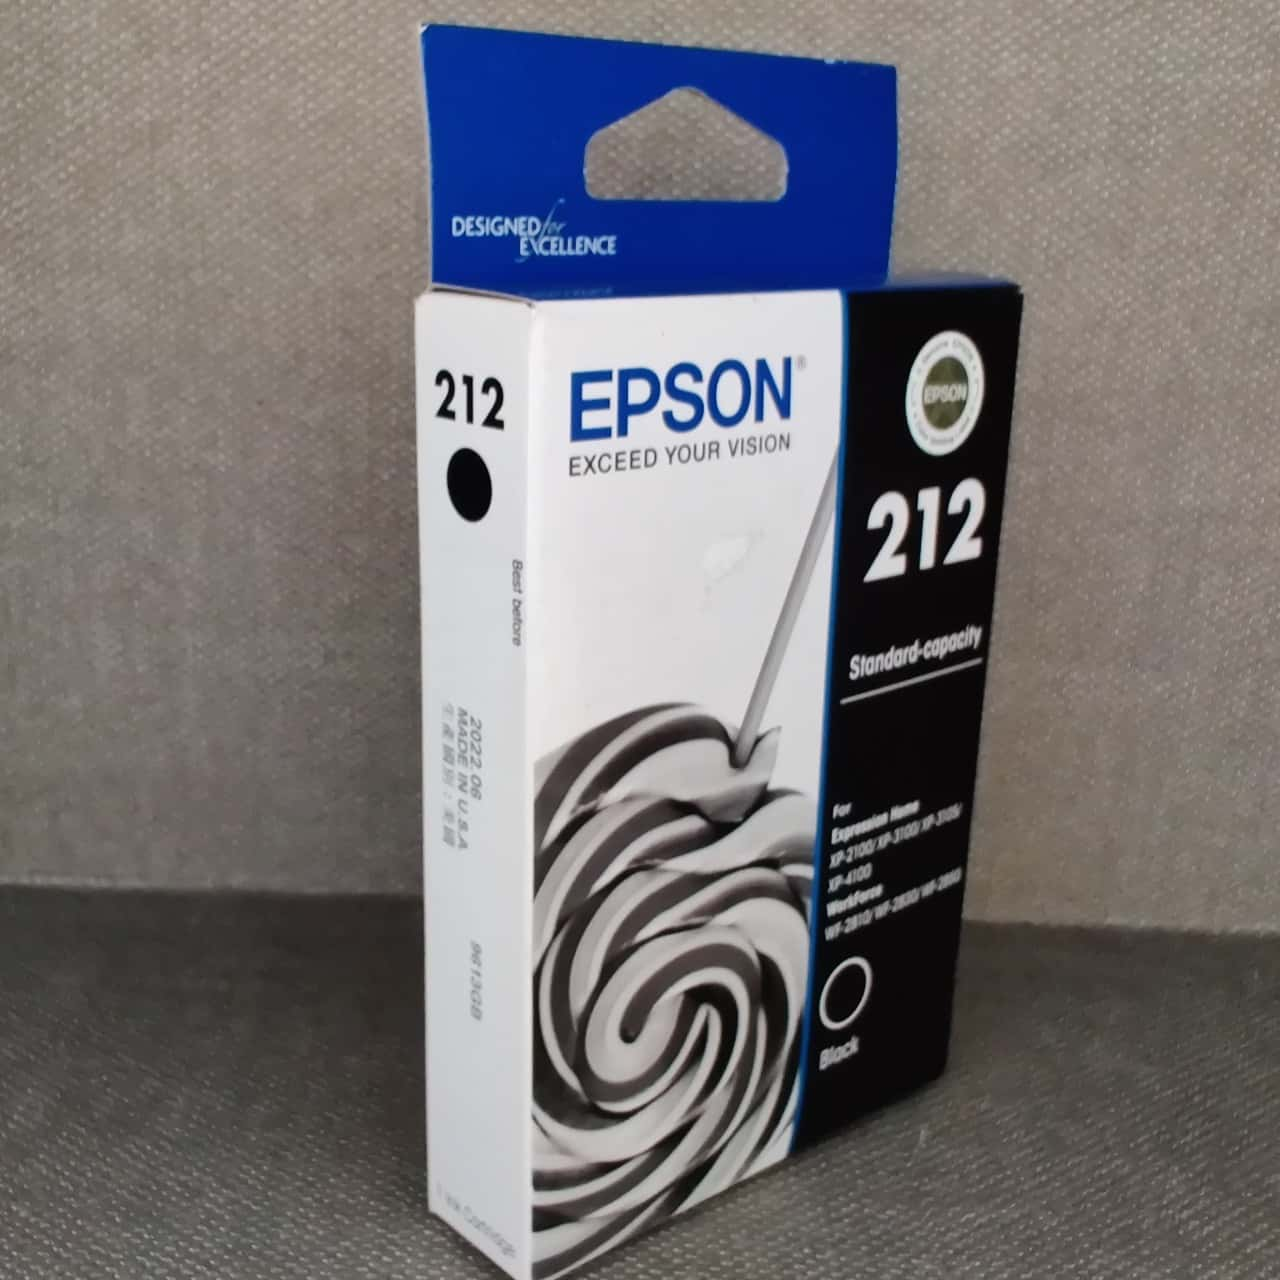 Epson 212 Black Inkjet Cartridge